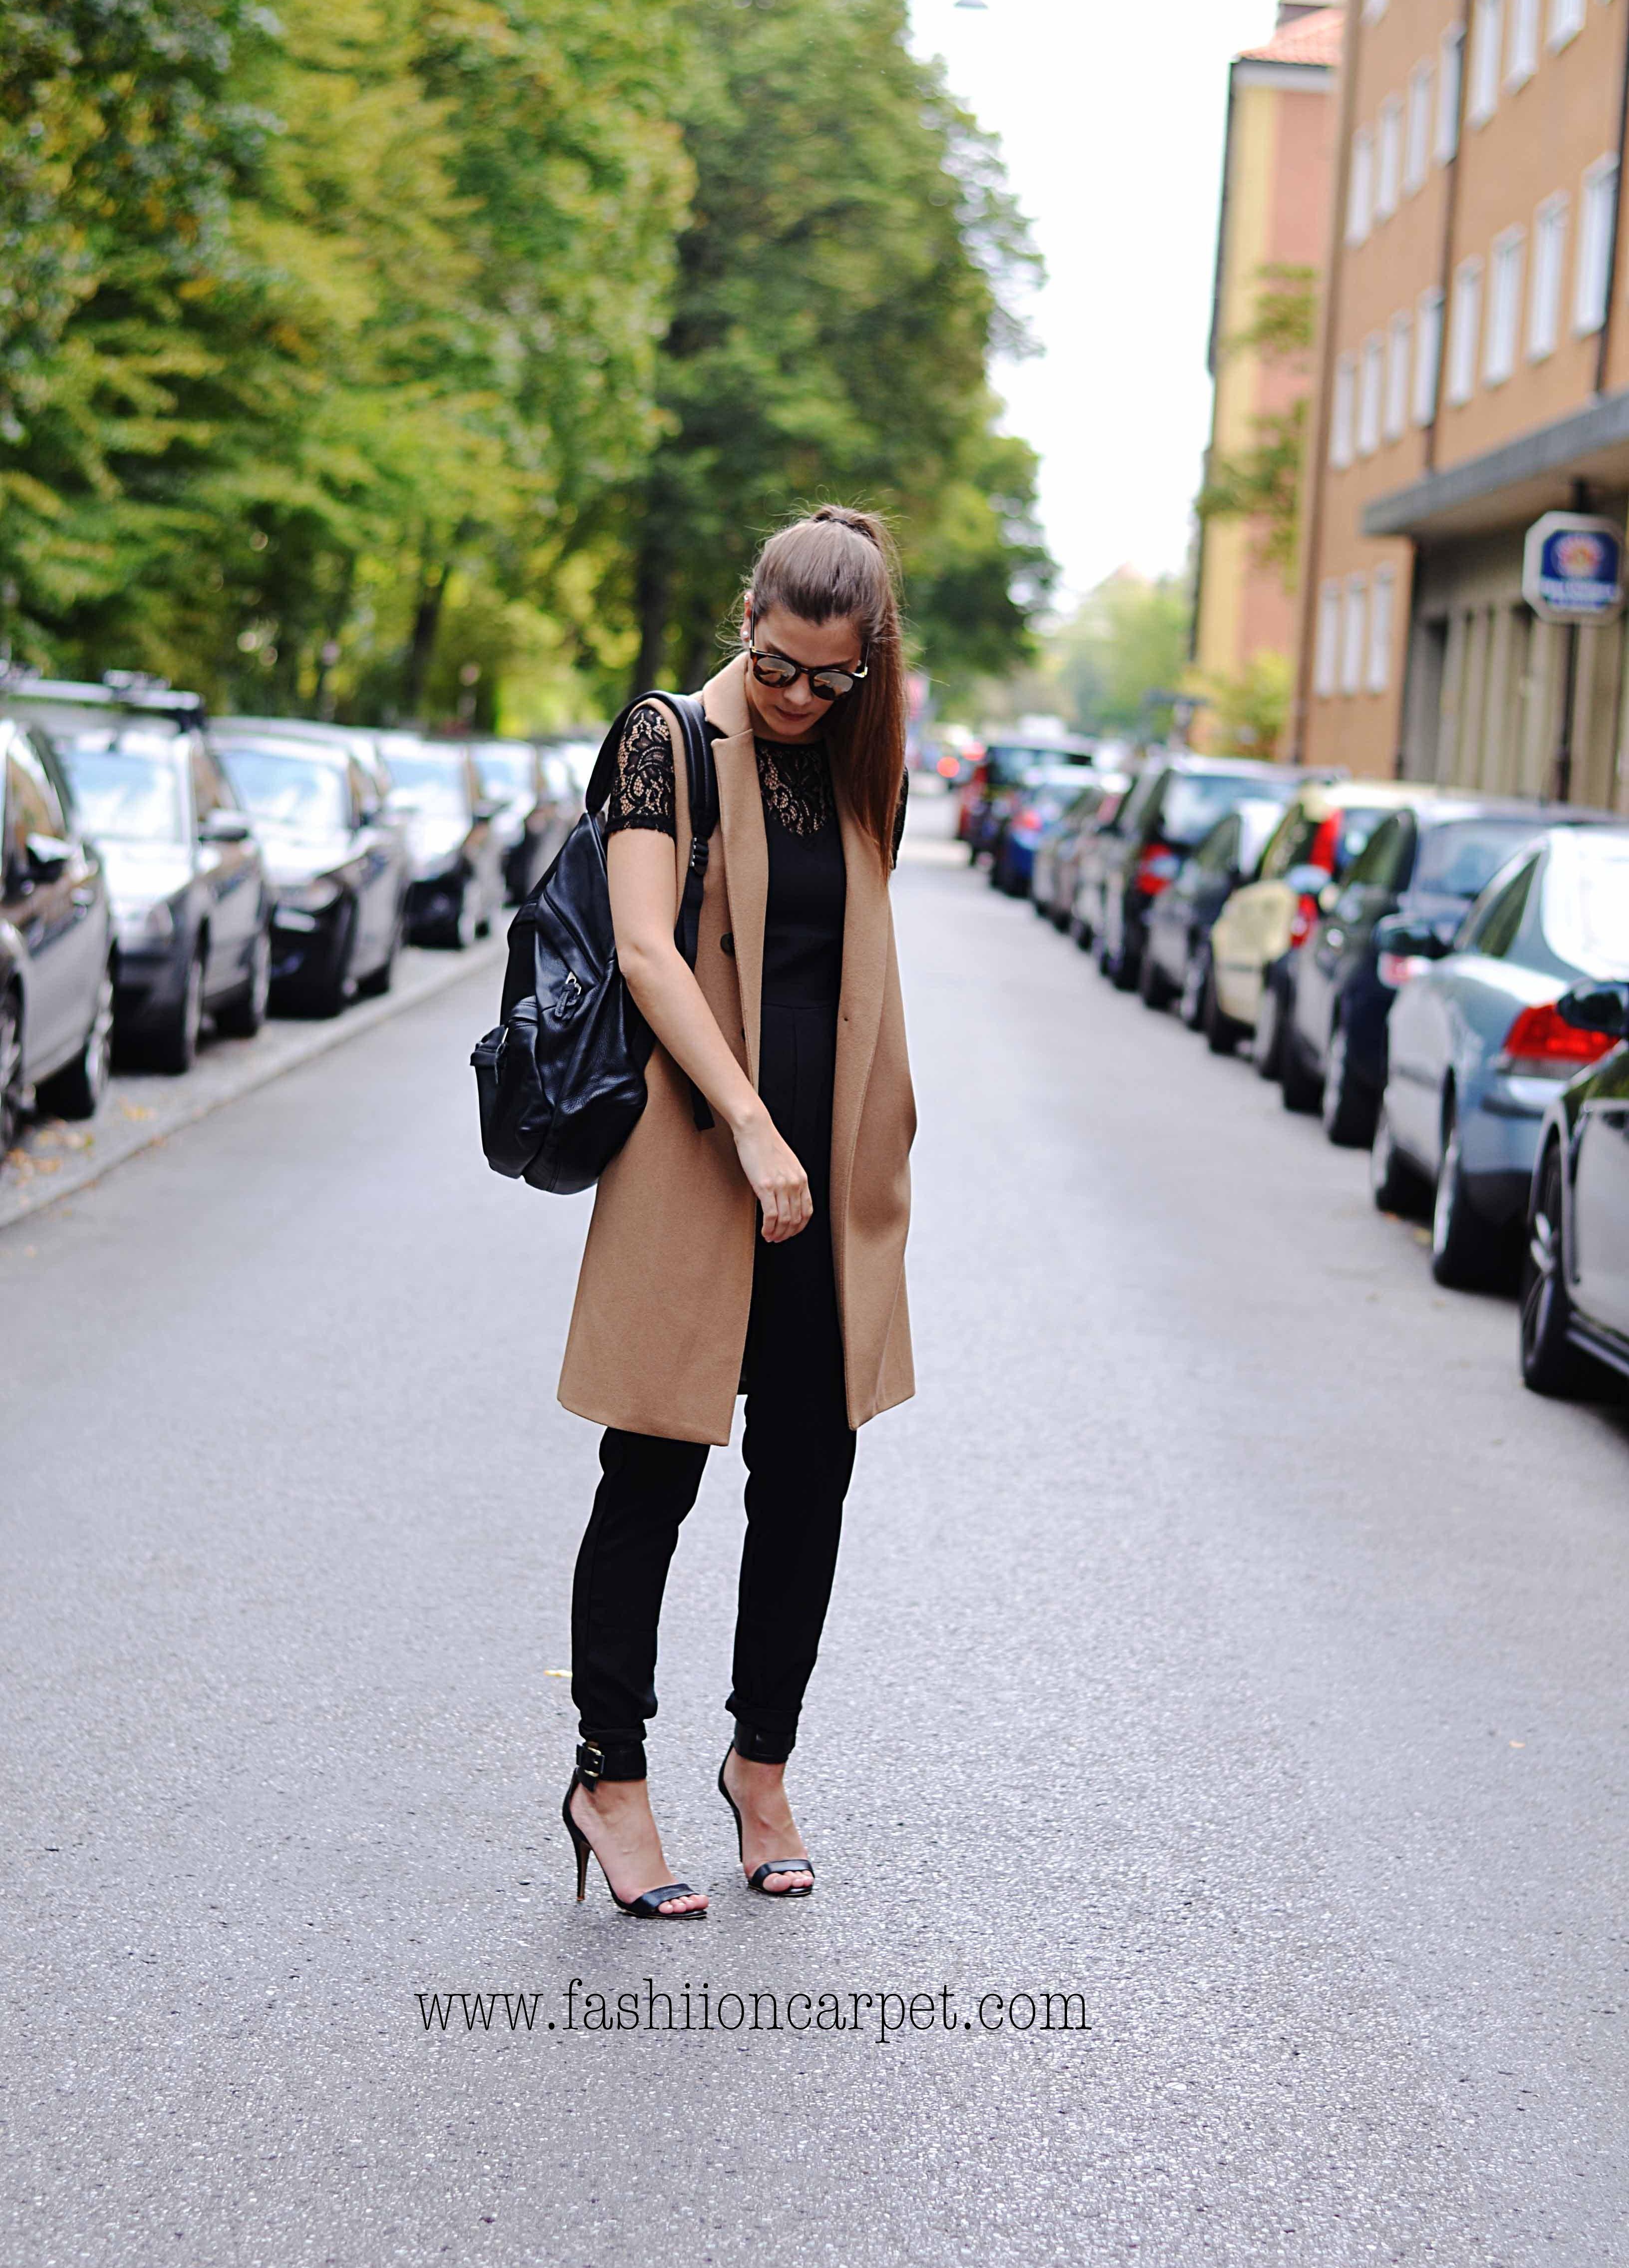 Mango-Lepecs-eastpak-zara-missguided-longweste-fashiioncarpet-outfit-mode-fashion-modeblogger-fashionblogger-fashionblog-münchen-blogger-blog-look10